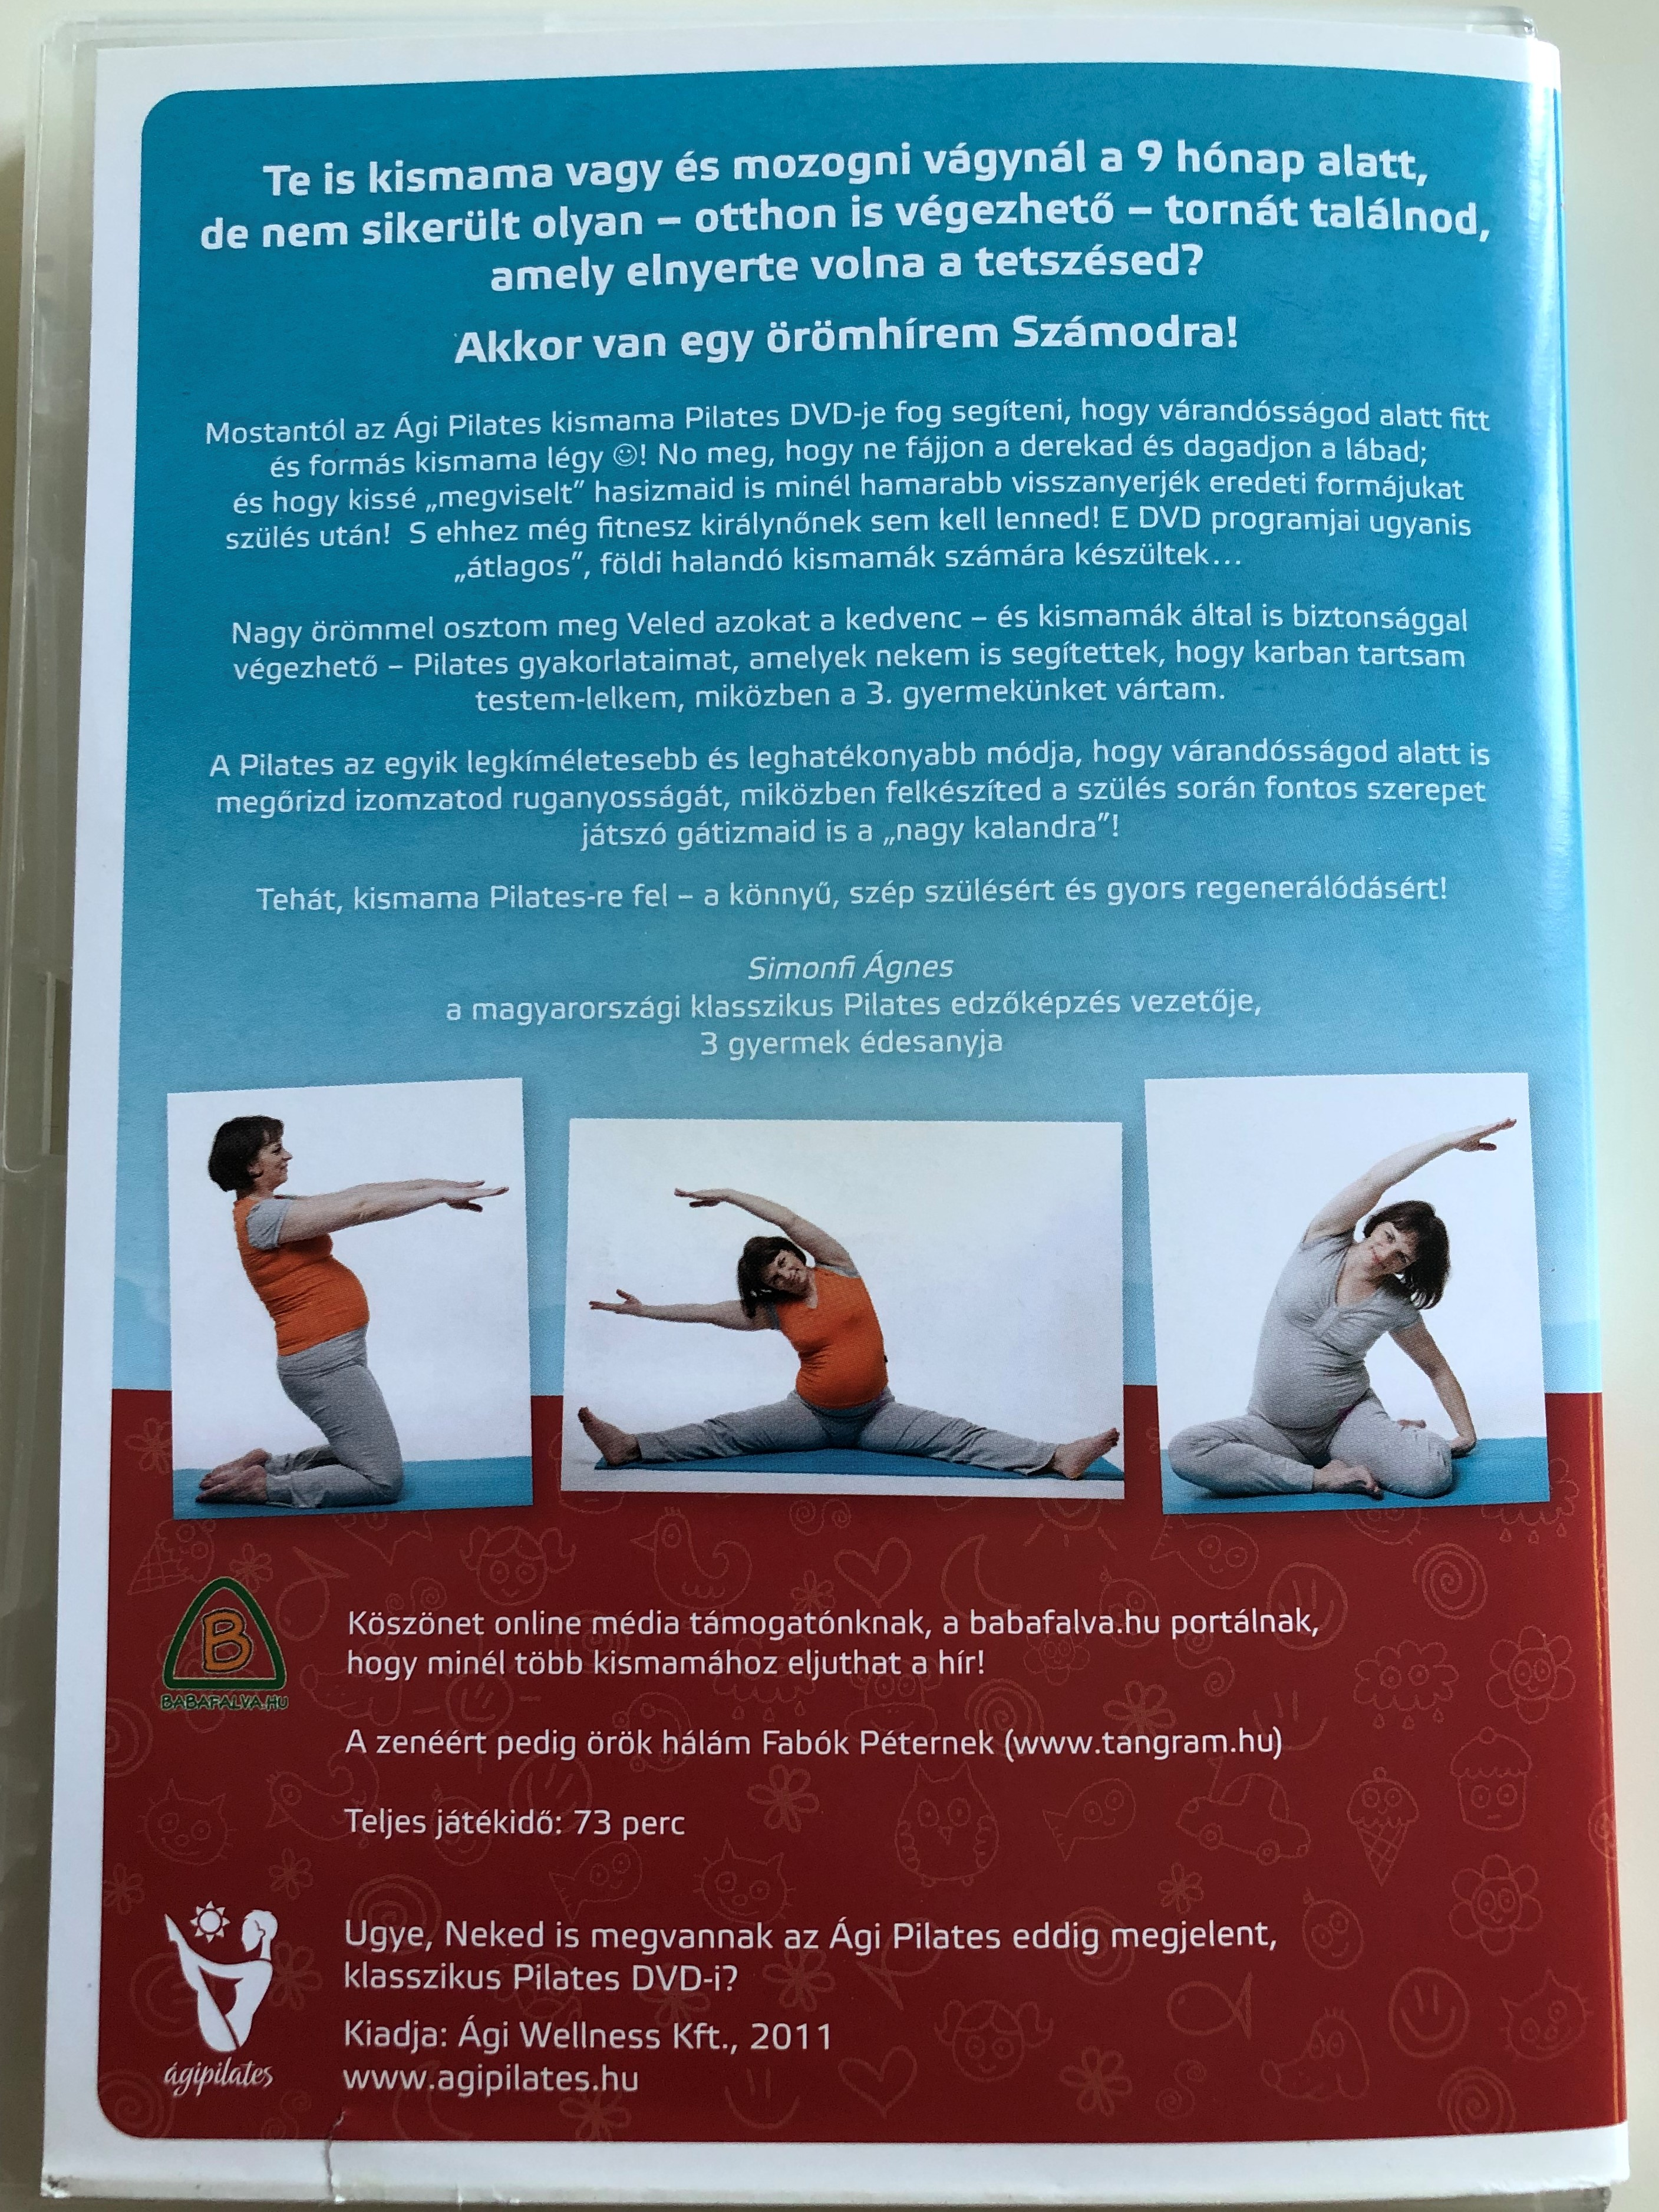 pocak-pilates-simonfi-gival-dvd-2011-pilates-for-pregnant-women-fitt-v-rand-s-g-kismama-pilates-gyakorlatokkal-a-k-nny-sz-p-sz-l-s-re-s-a-gyors-regener-l-d-s-rt-2-.jpg